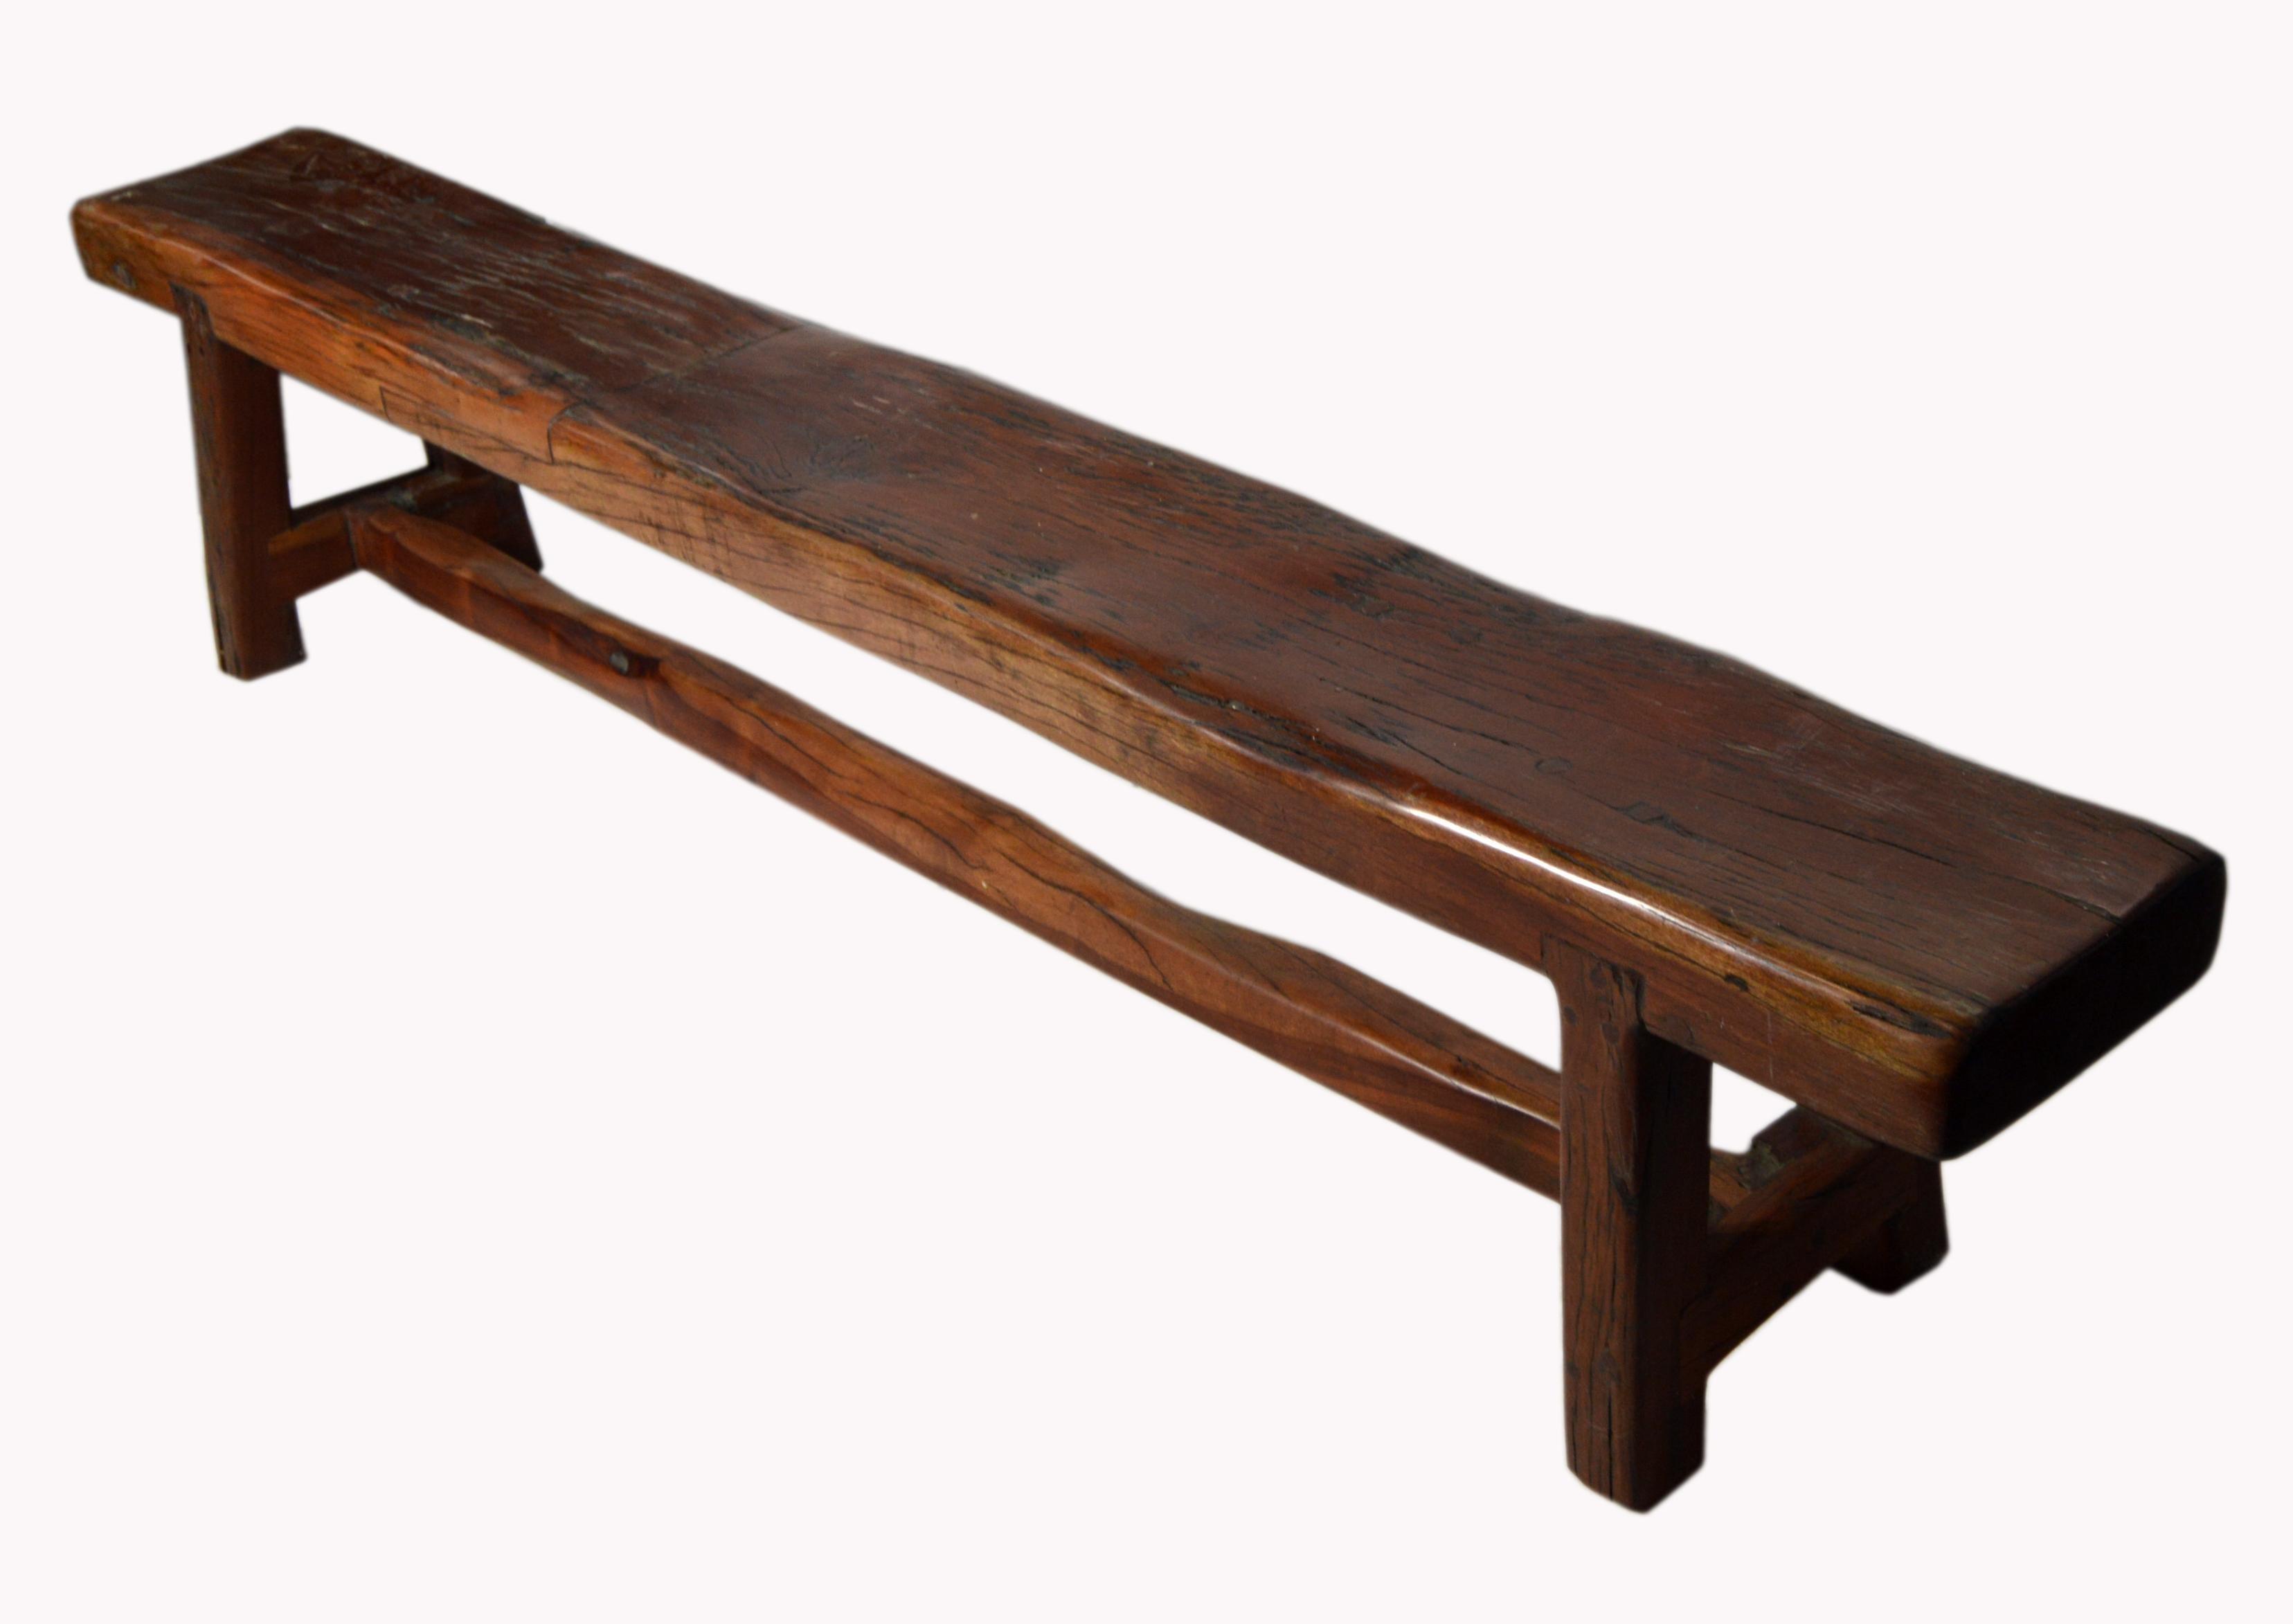 Vintage Handmade Javanese Brown Wood Narrow Bench With Splayed Legs For At 1stdibs